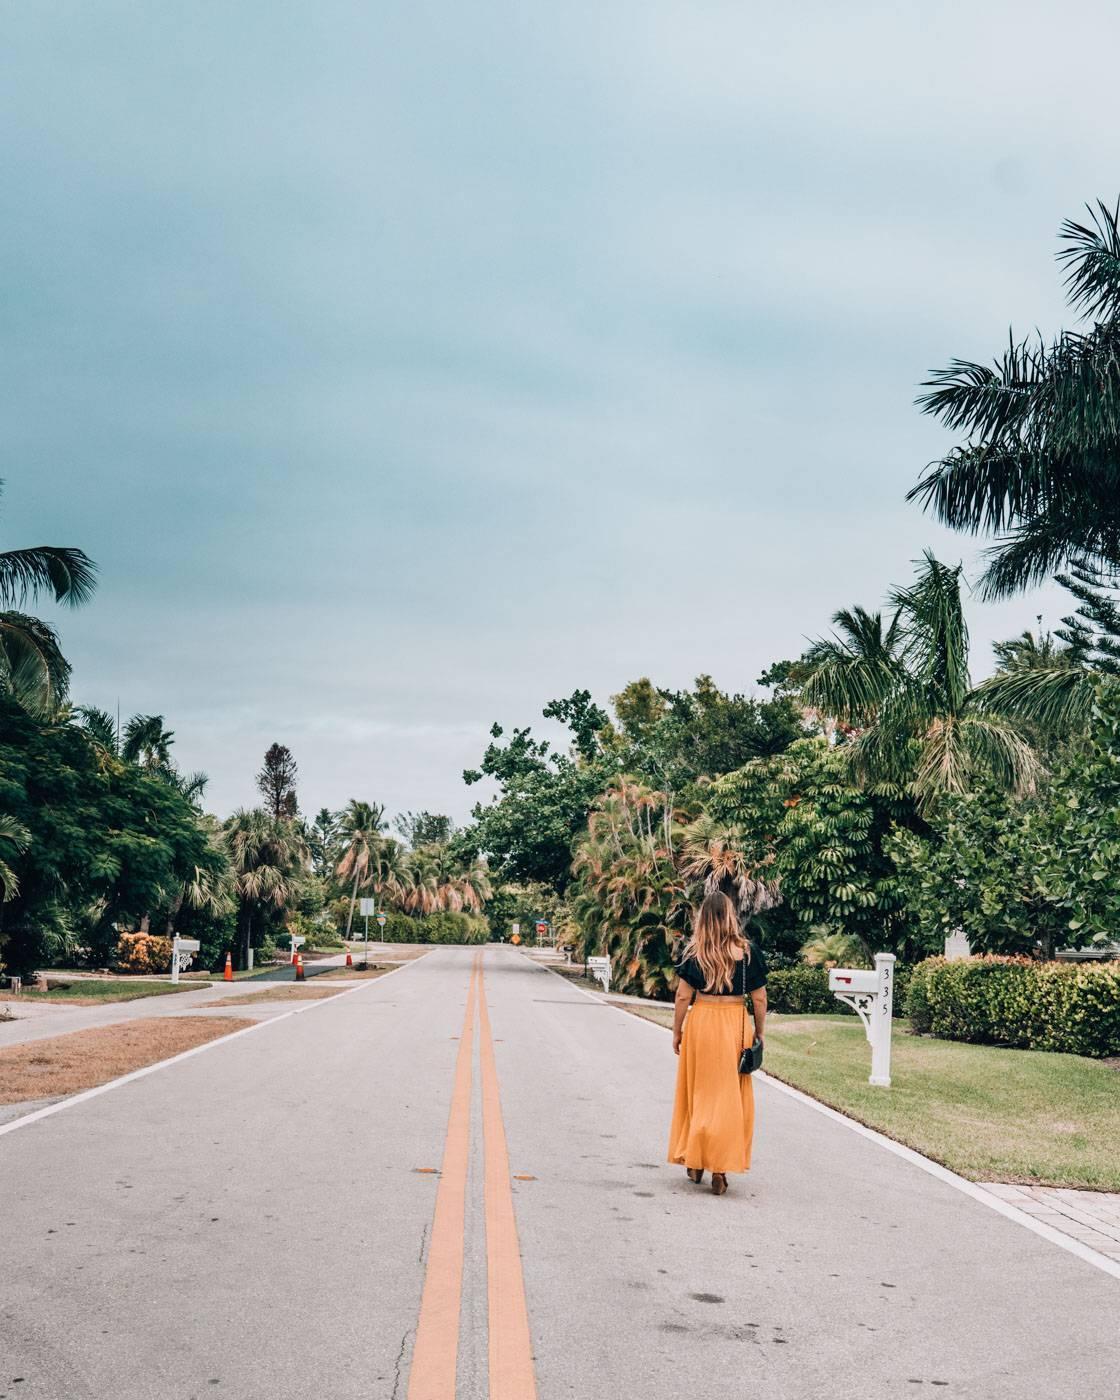 Biking around the quiet town of Sanibel Island